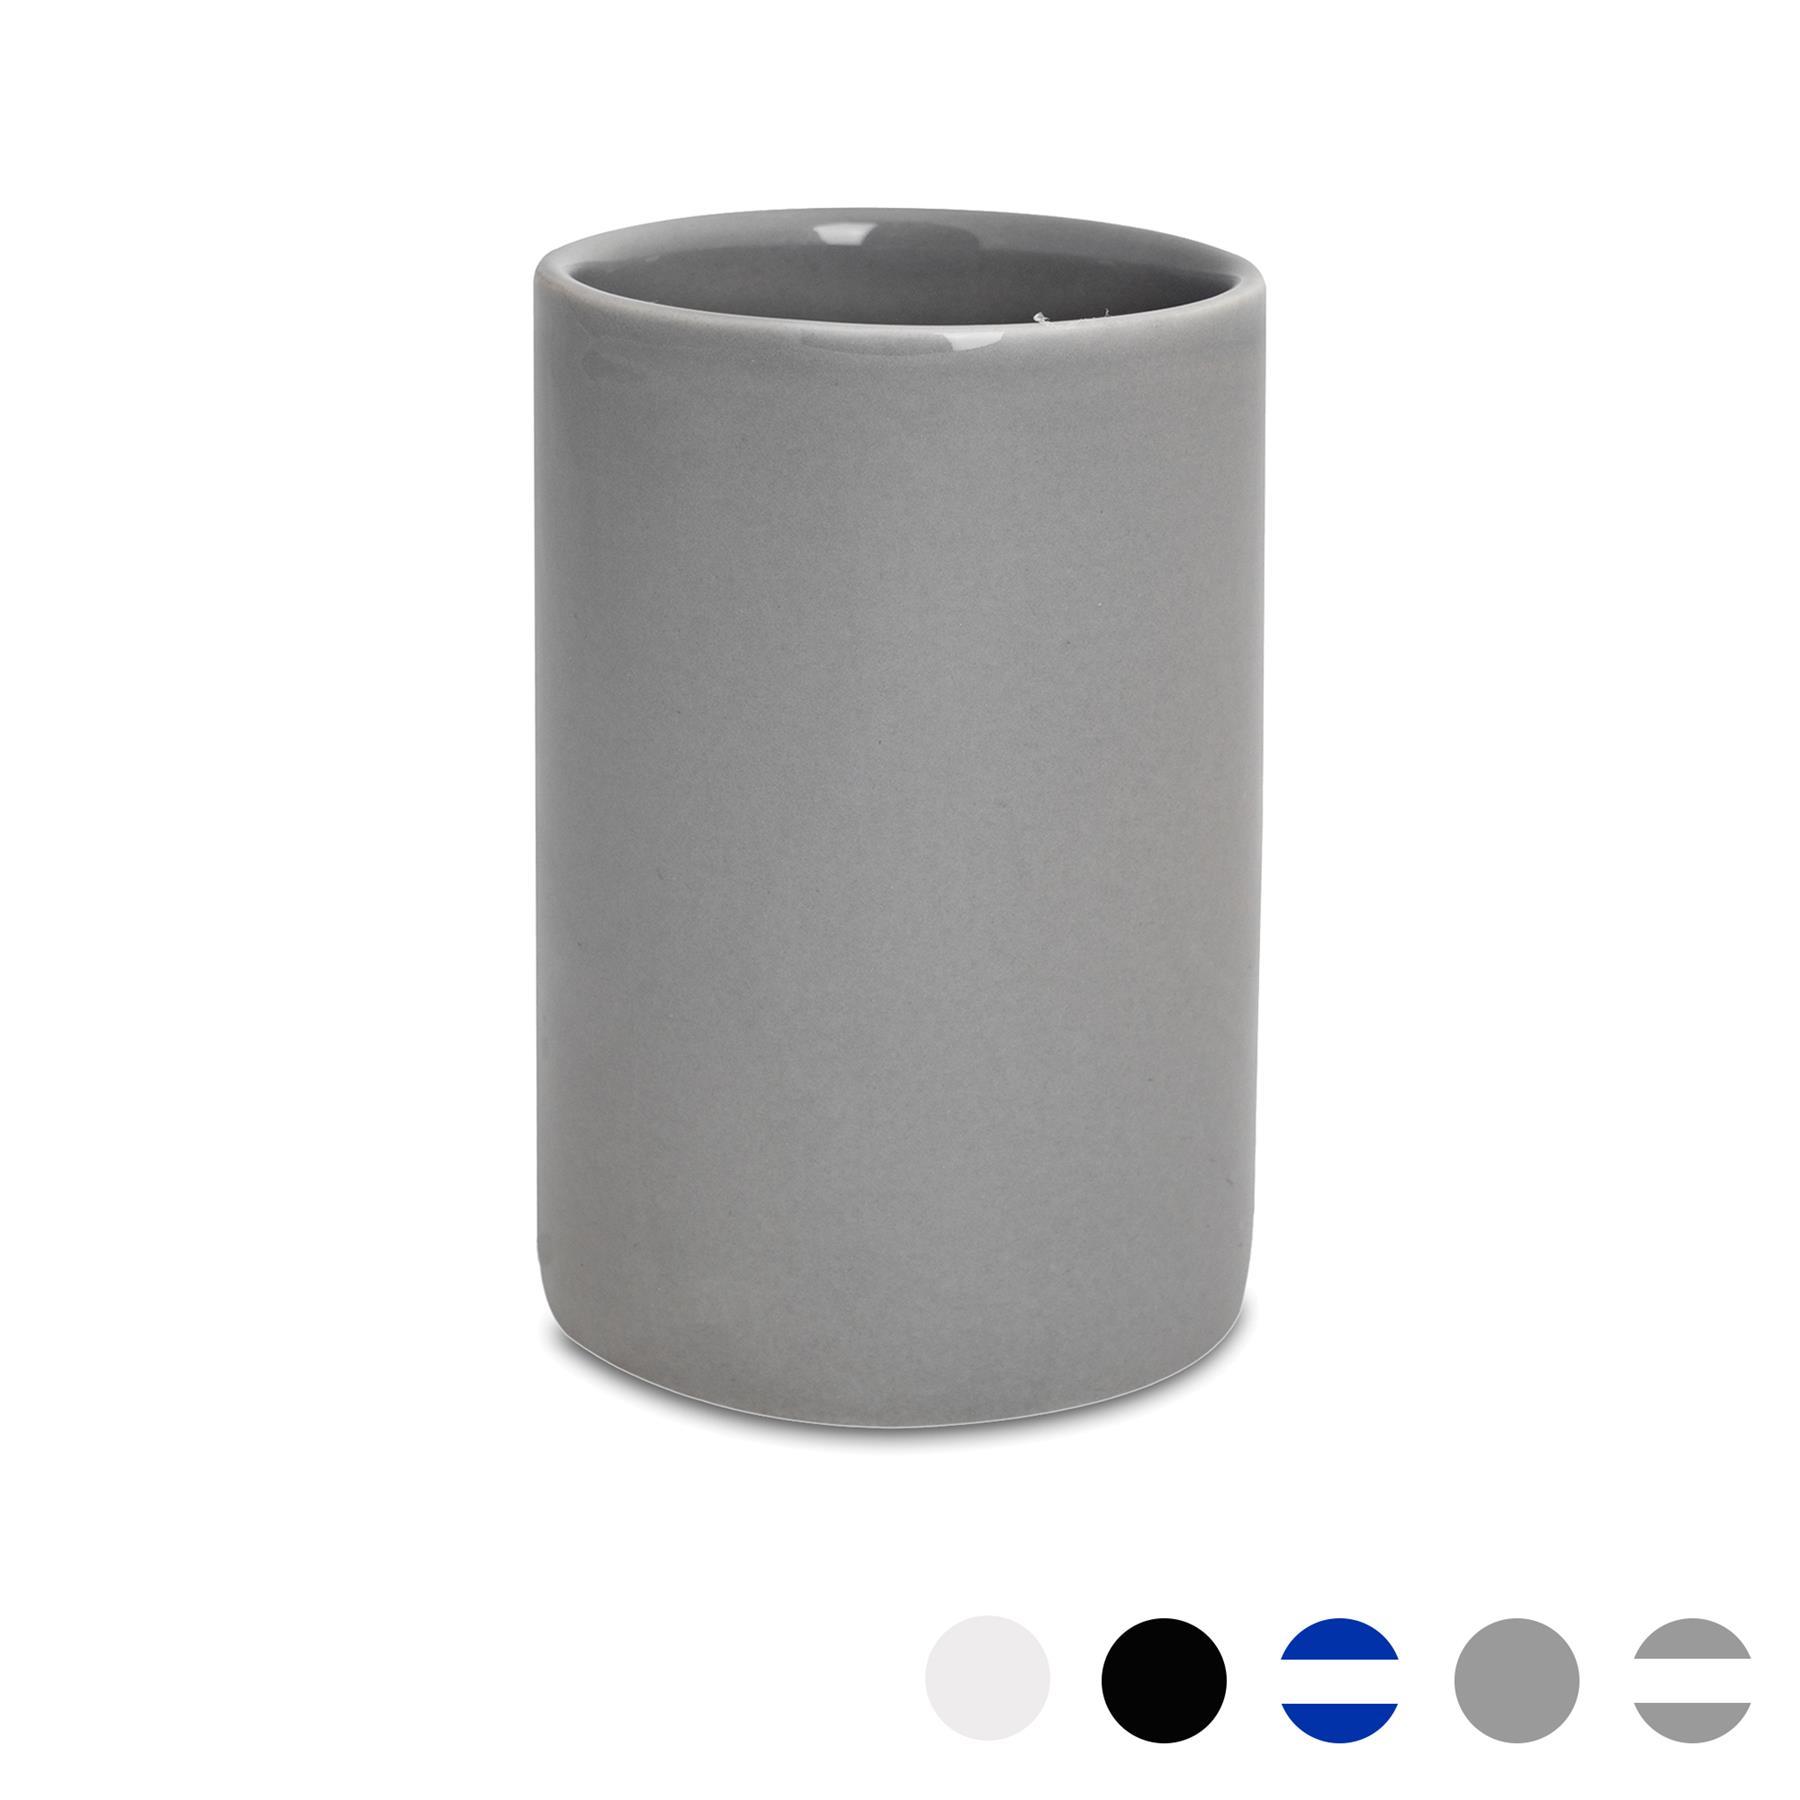 Bathroom Toothbrush Holder Tumbler Glazed Ceramic Porcelain Cup Stand Grey 5055512076079 Ebay